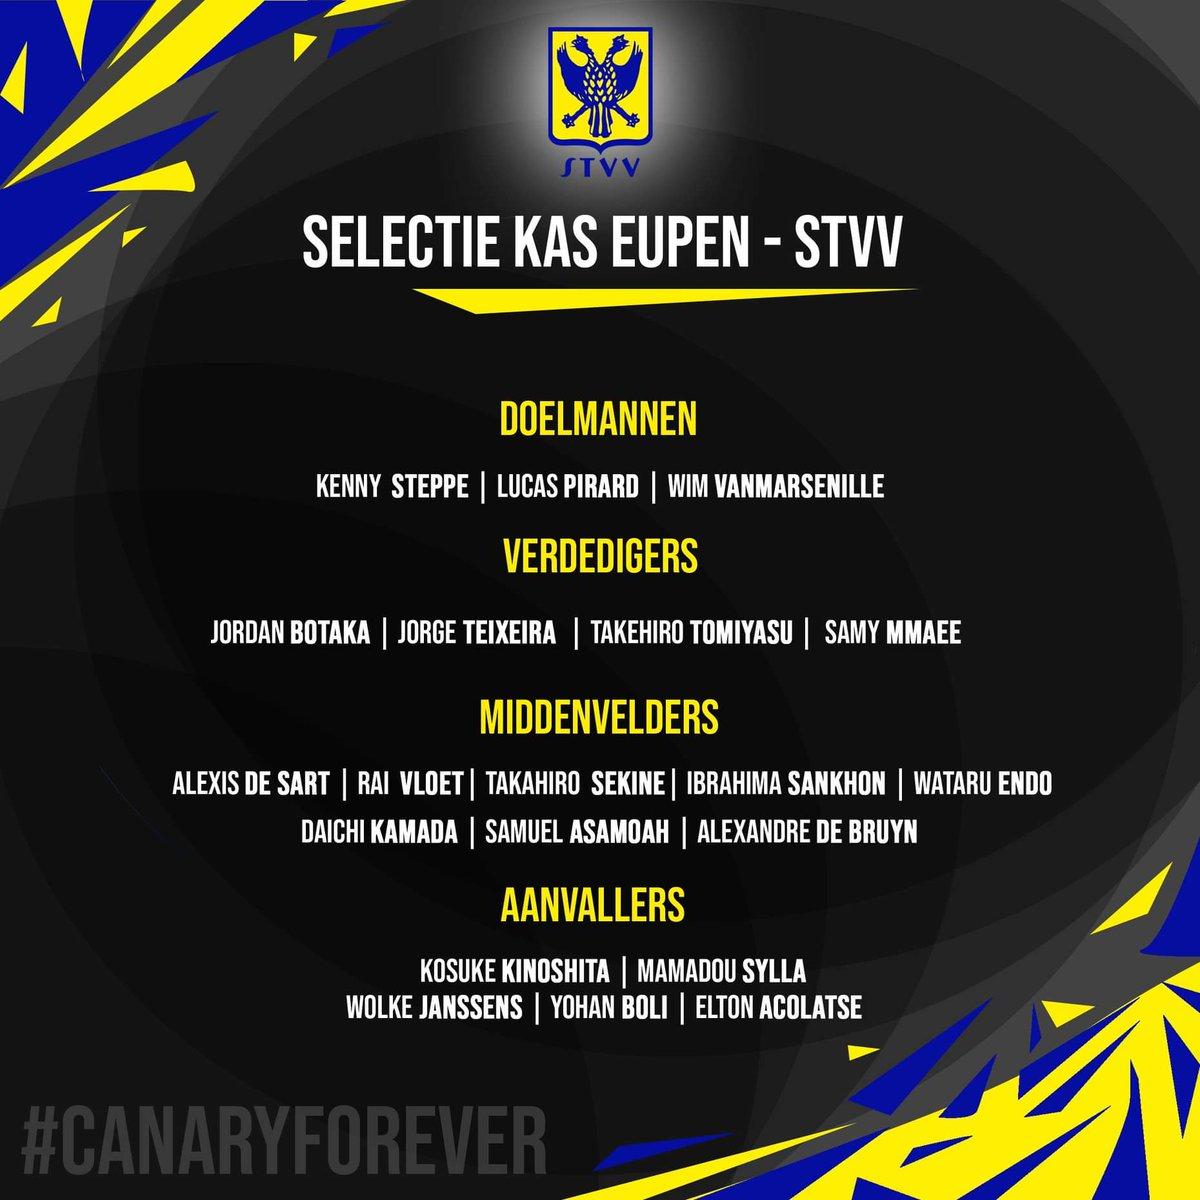 STVV @stvv